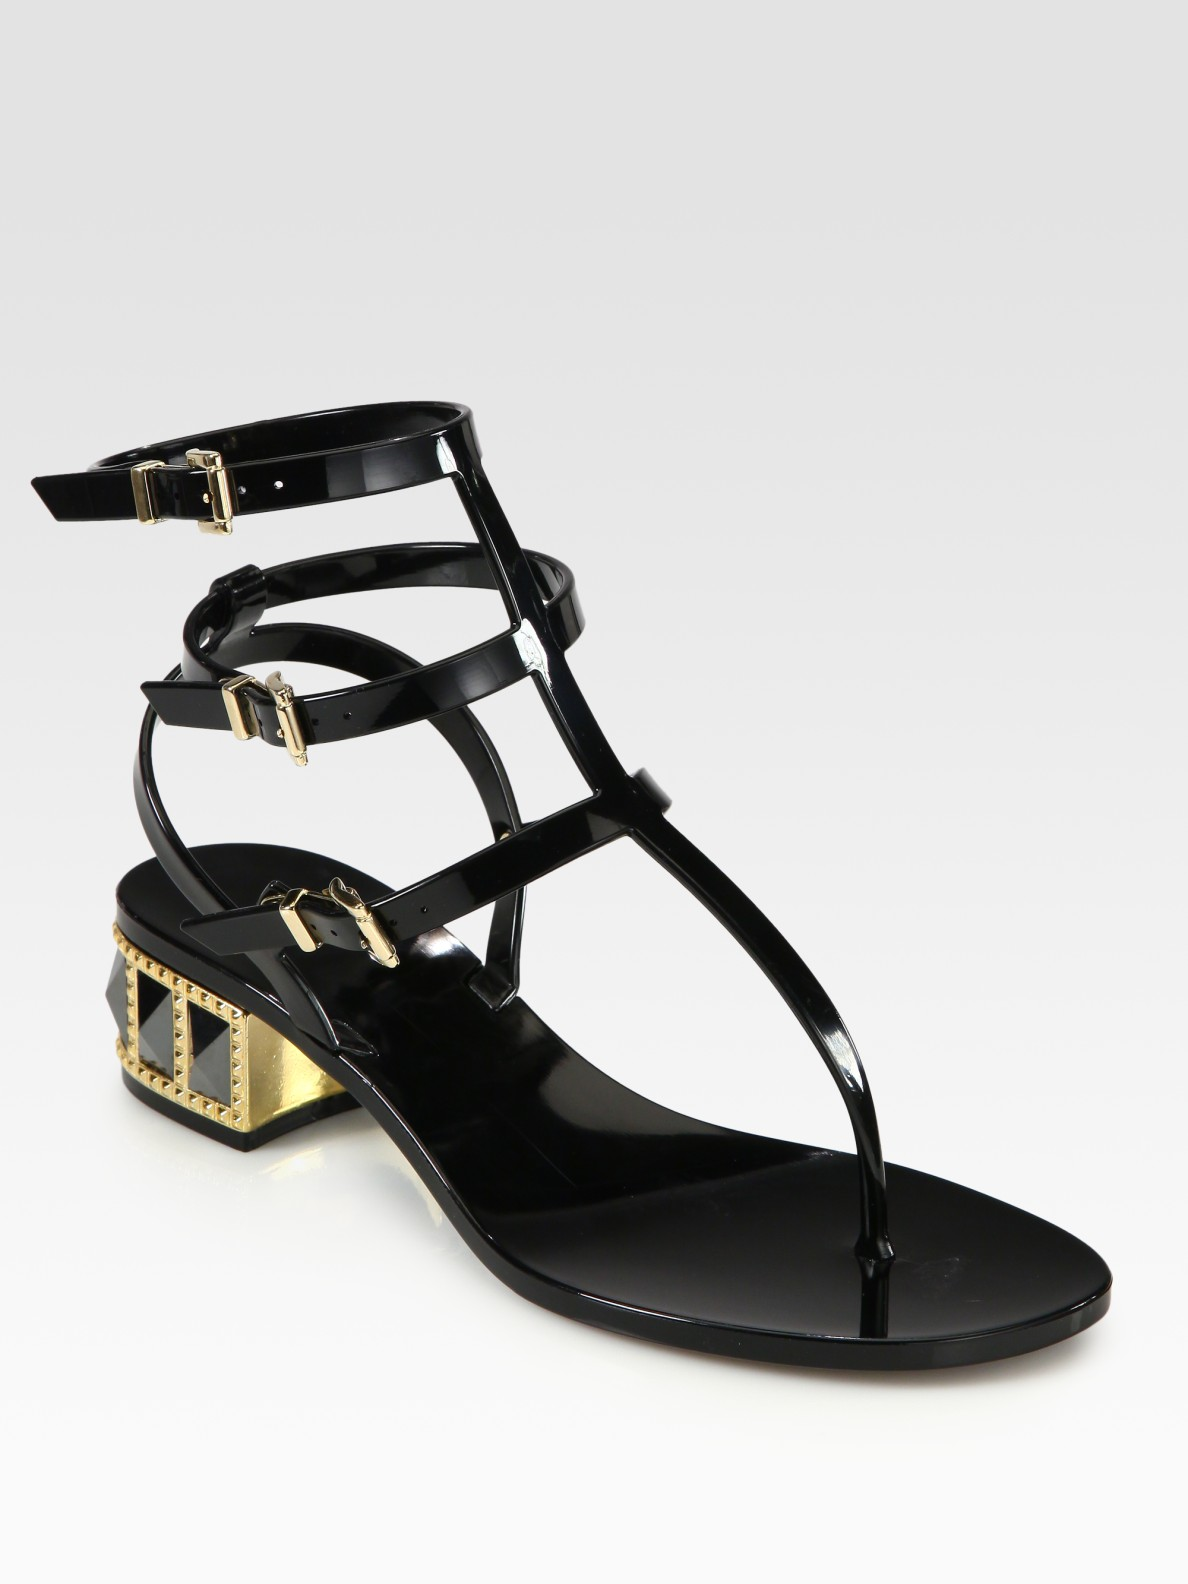 Valentino Rhinestone-studded Thong Sandals in Black